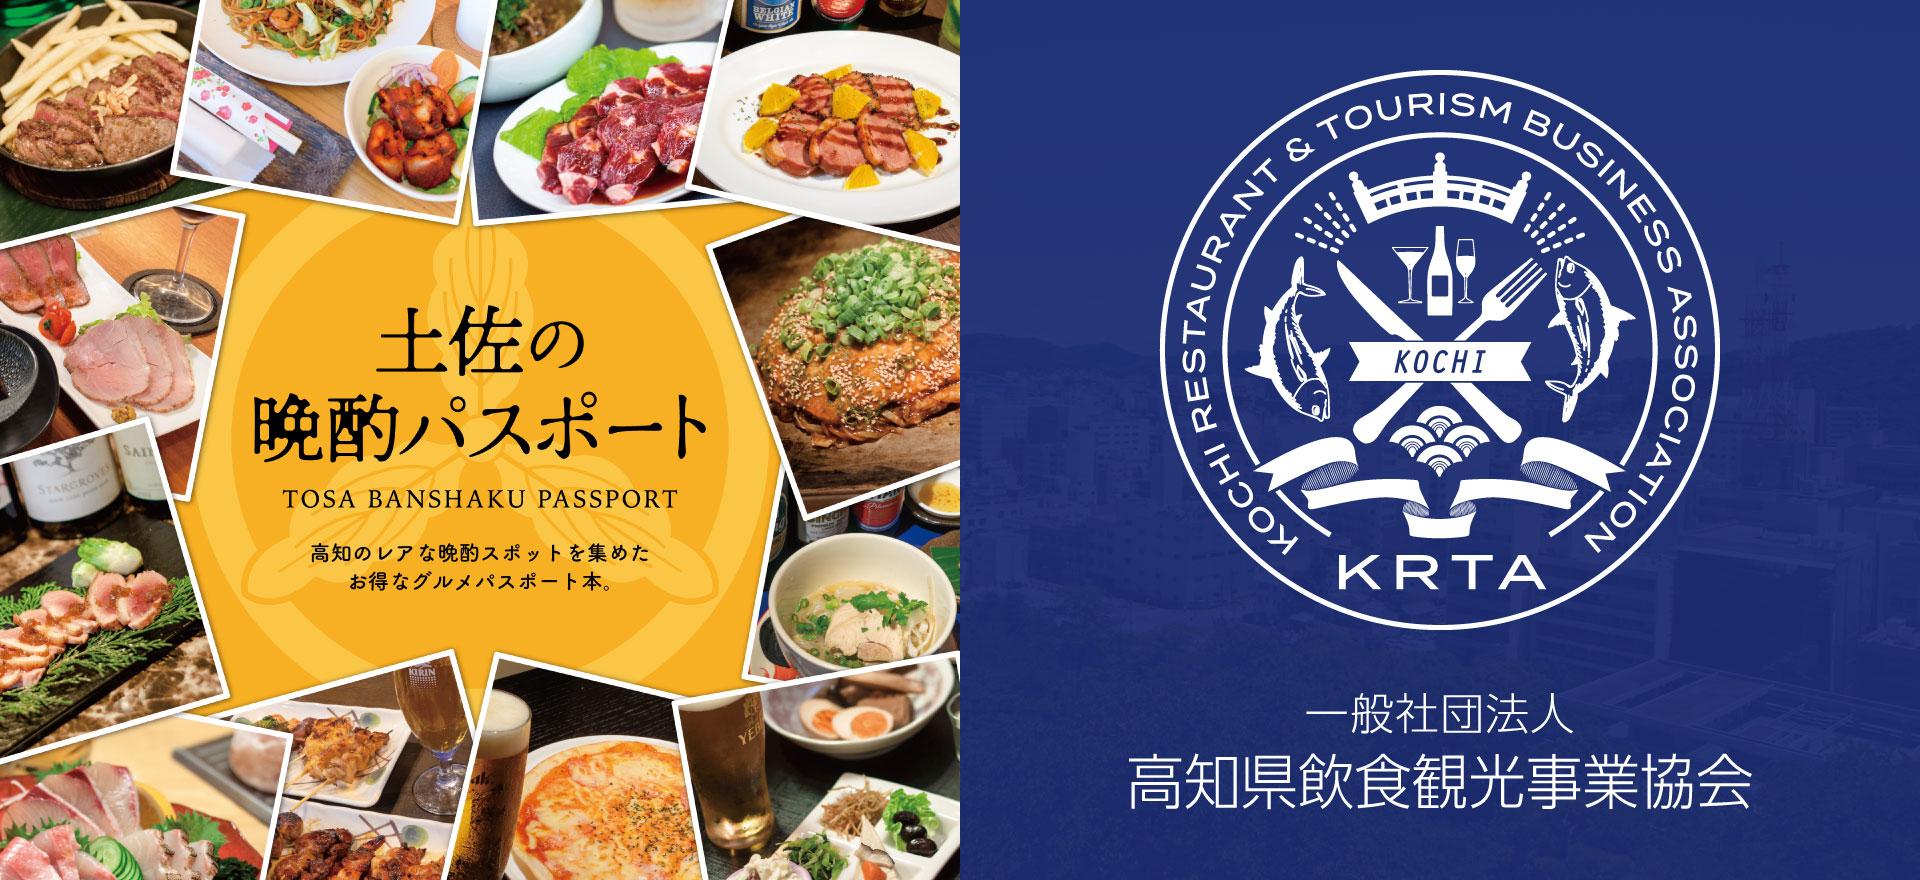 Online Store@高知県飲食観光事業協会